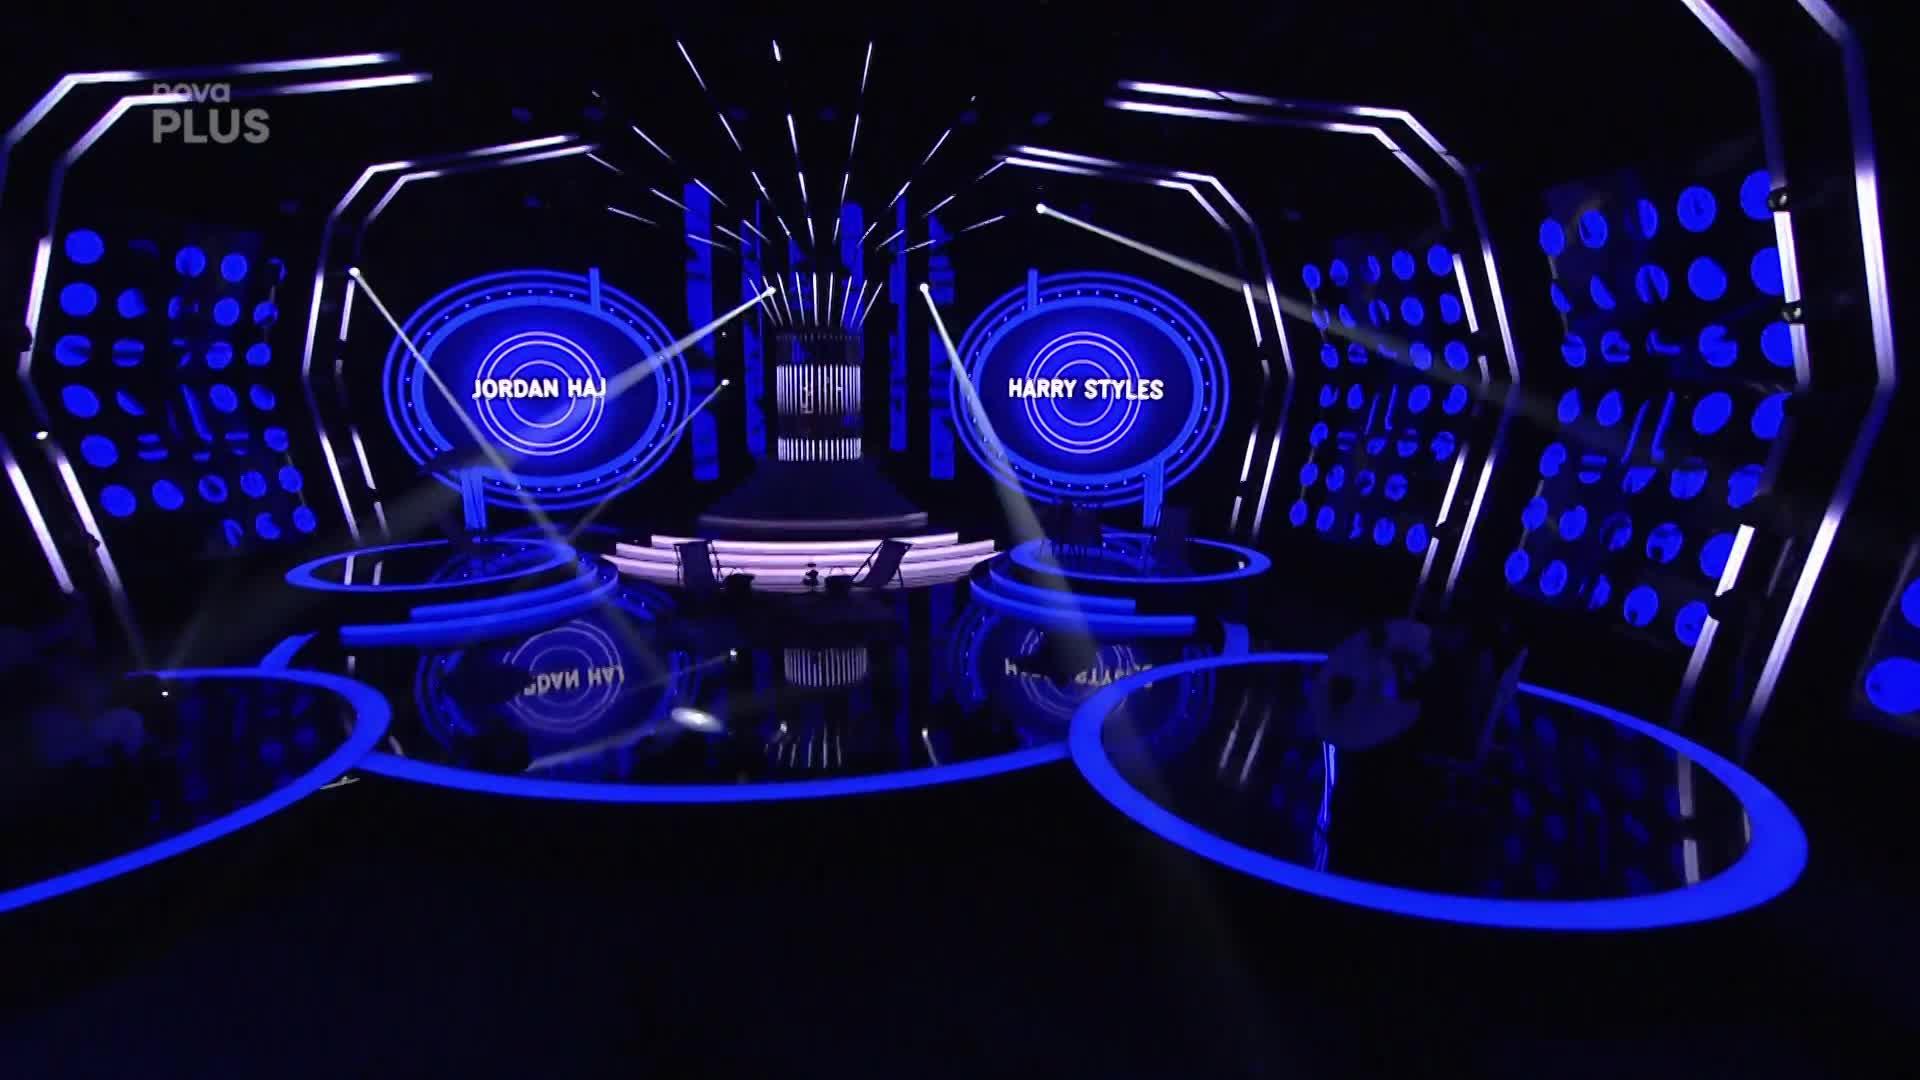 Bonusové reportáže 2020 Tvář - výstřižky z dílů - Jordan Haj - Harry Styles B094388